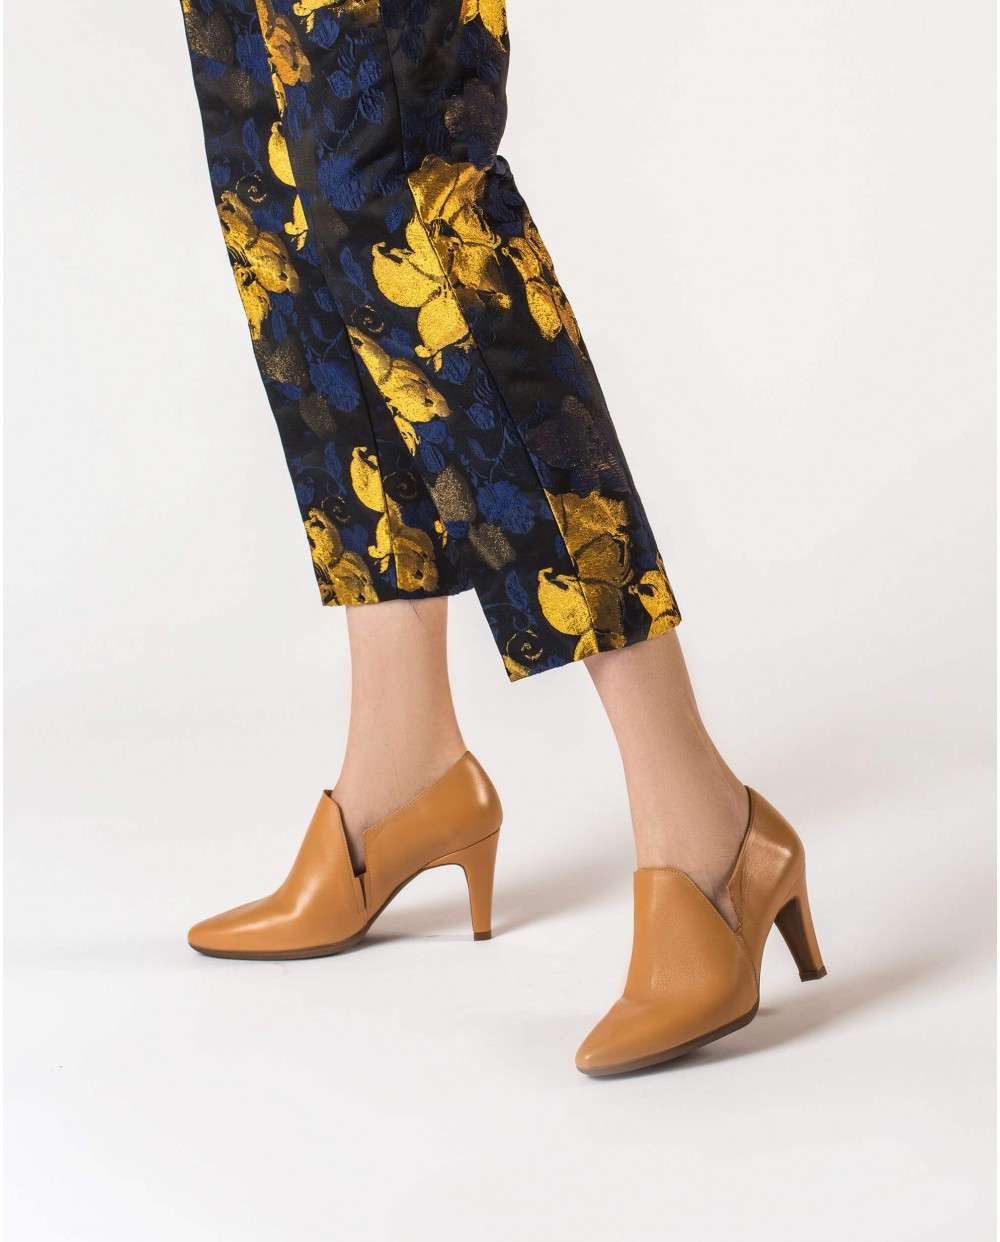 Wonders-Heels-Leather boot inspired shoe